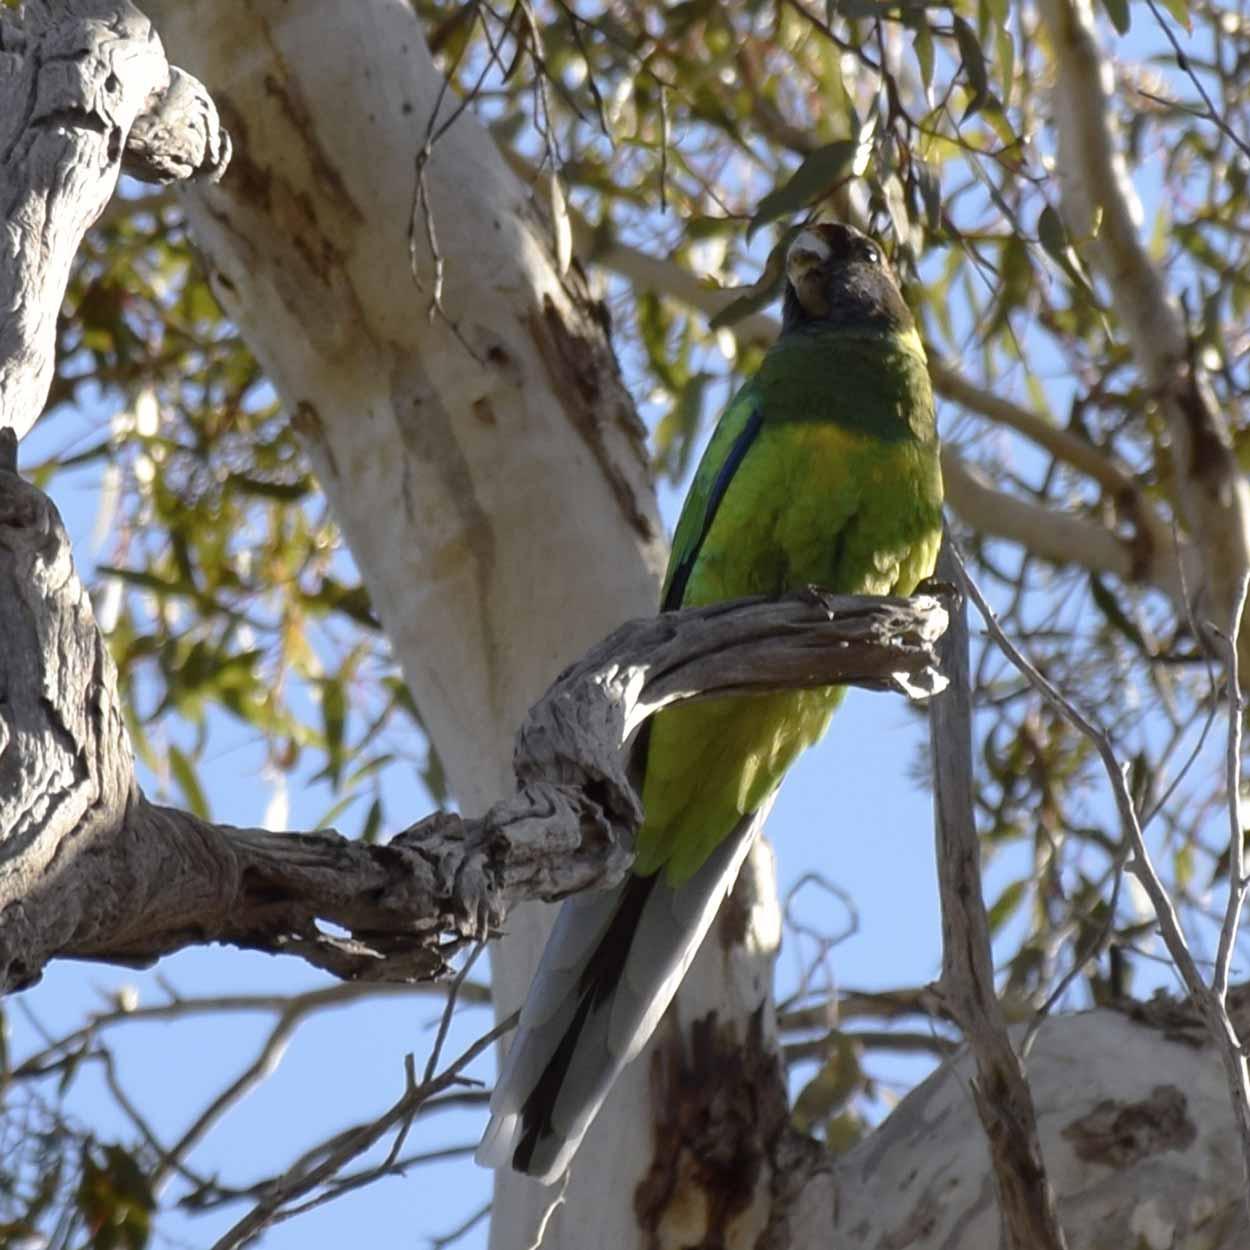 Australian Ringneck Parrot (Barnardius zonarius), Ellis Brook Valley Reserve, Perth, Western Australia